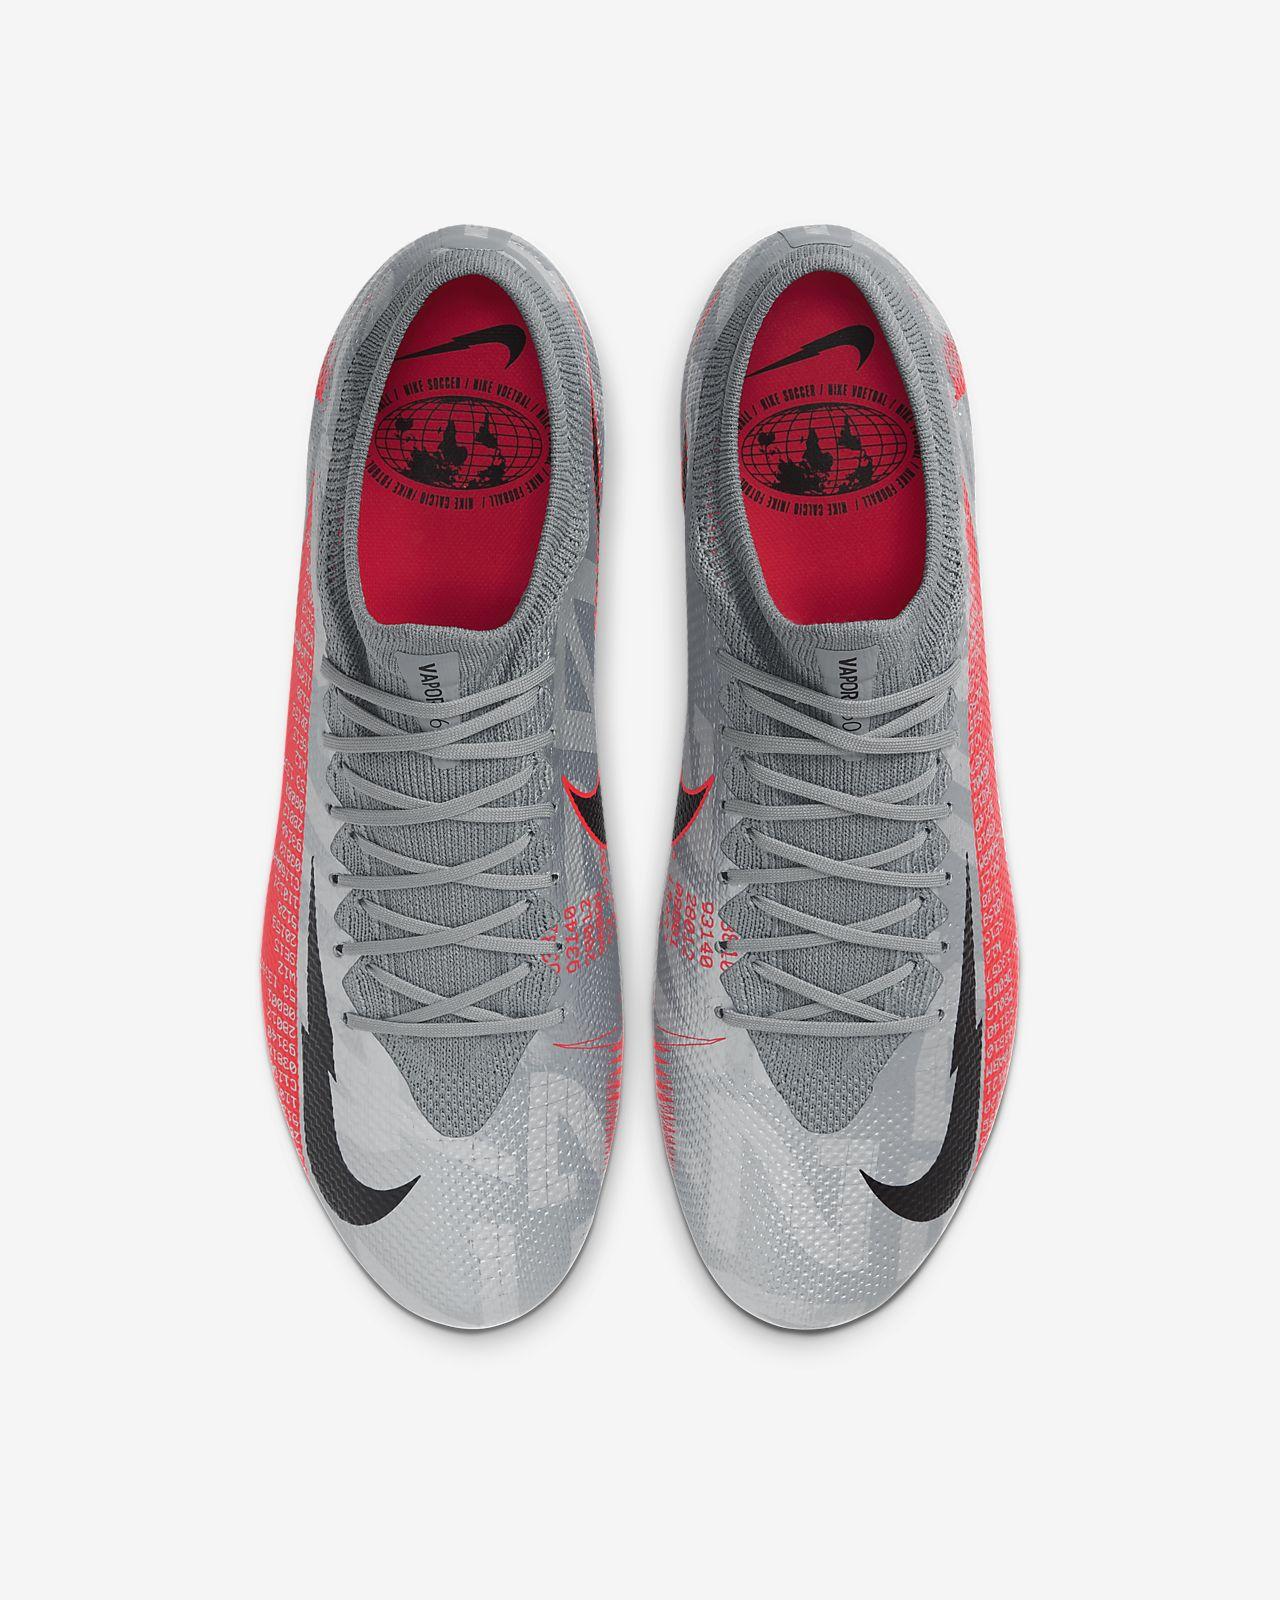 Nike Mercurial Vapor 13 Pro FG Voetbalschoen (stevige ondergrond)